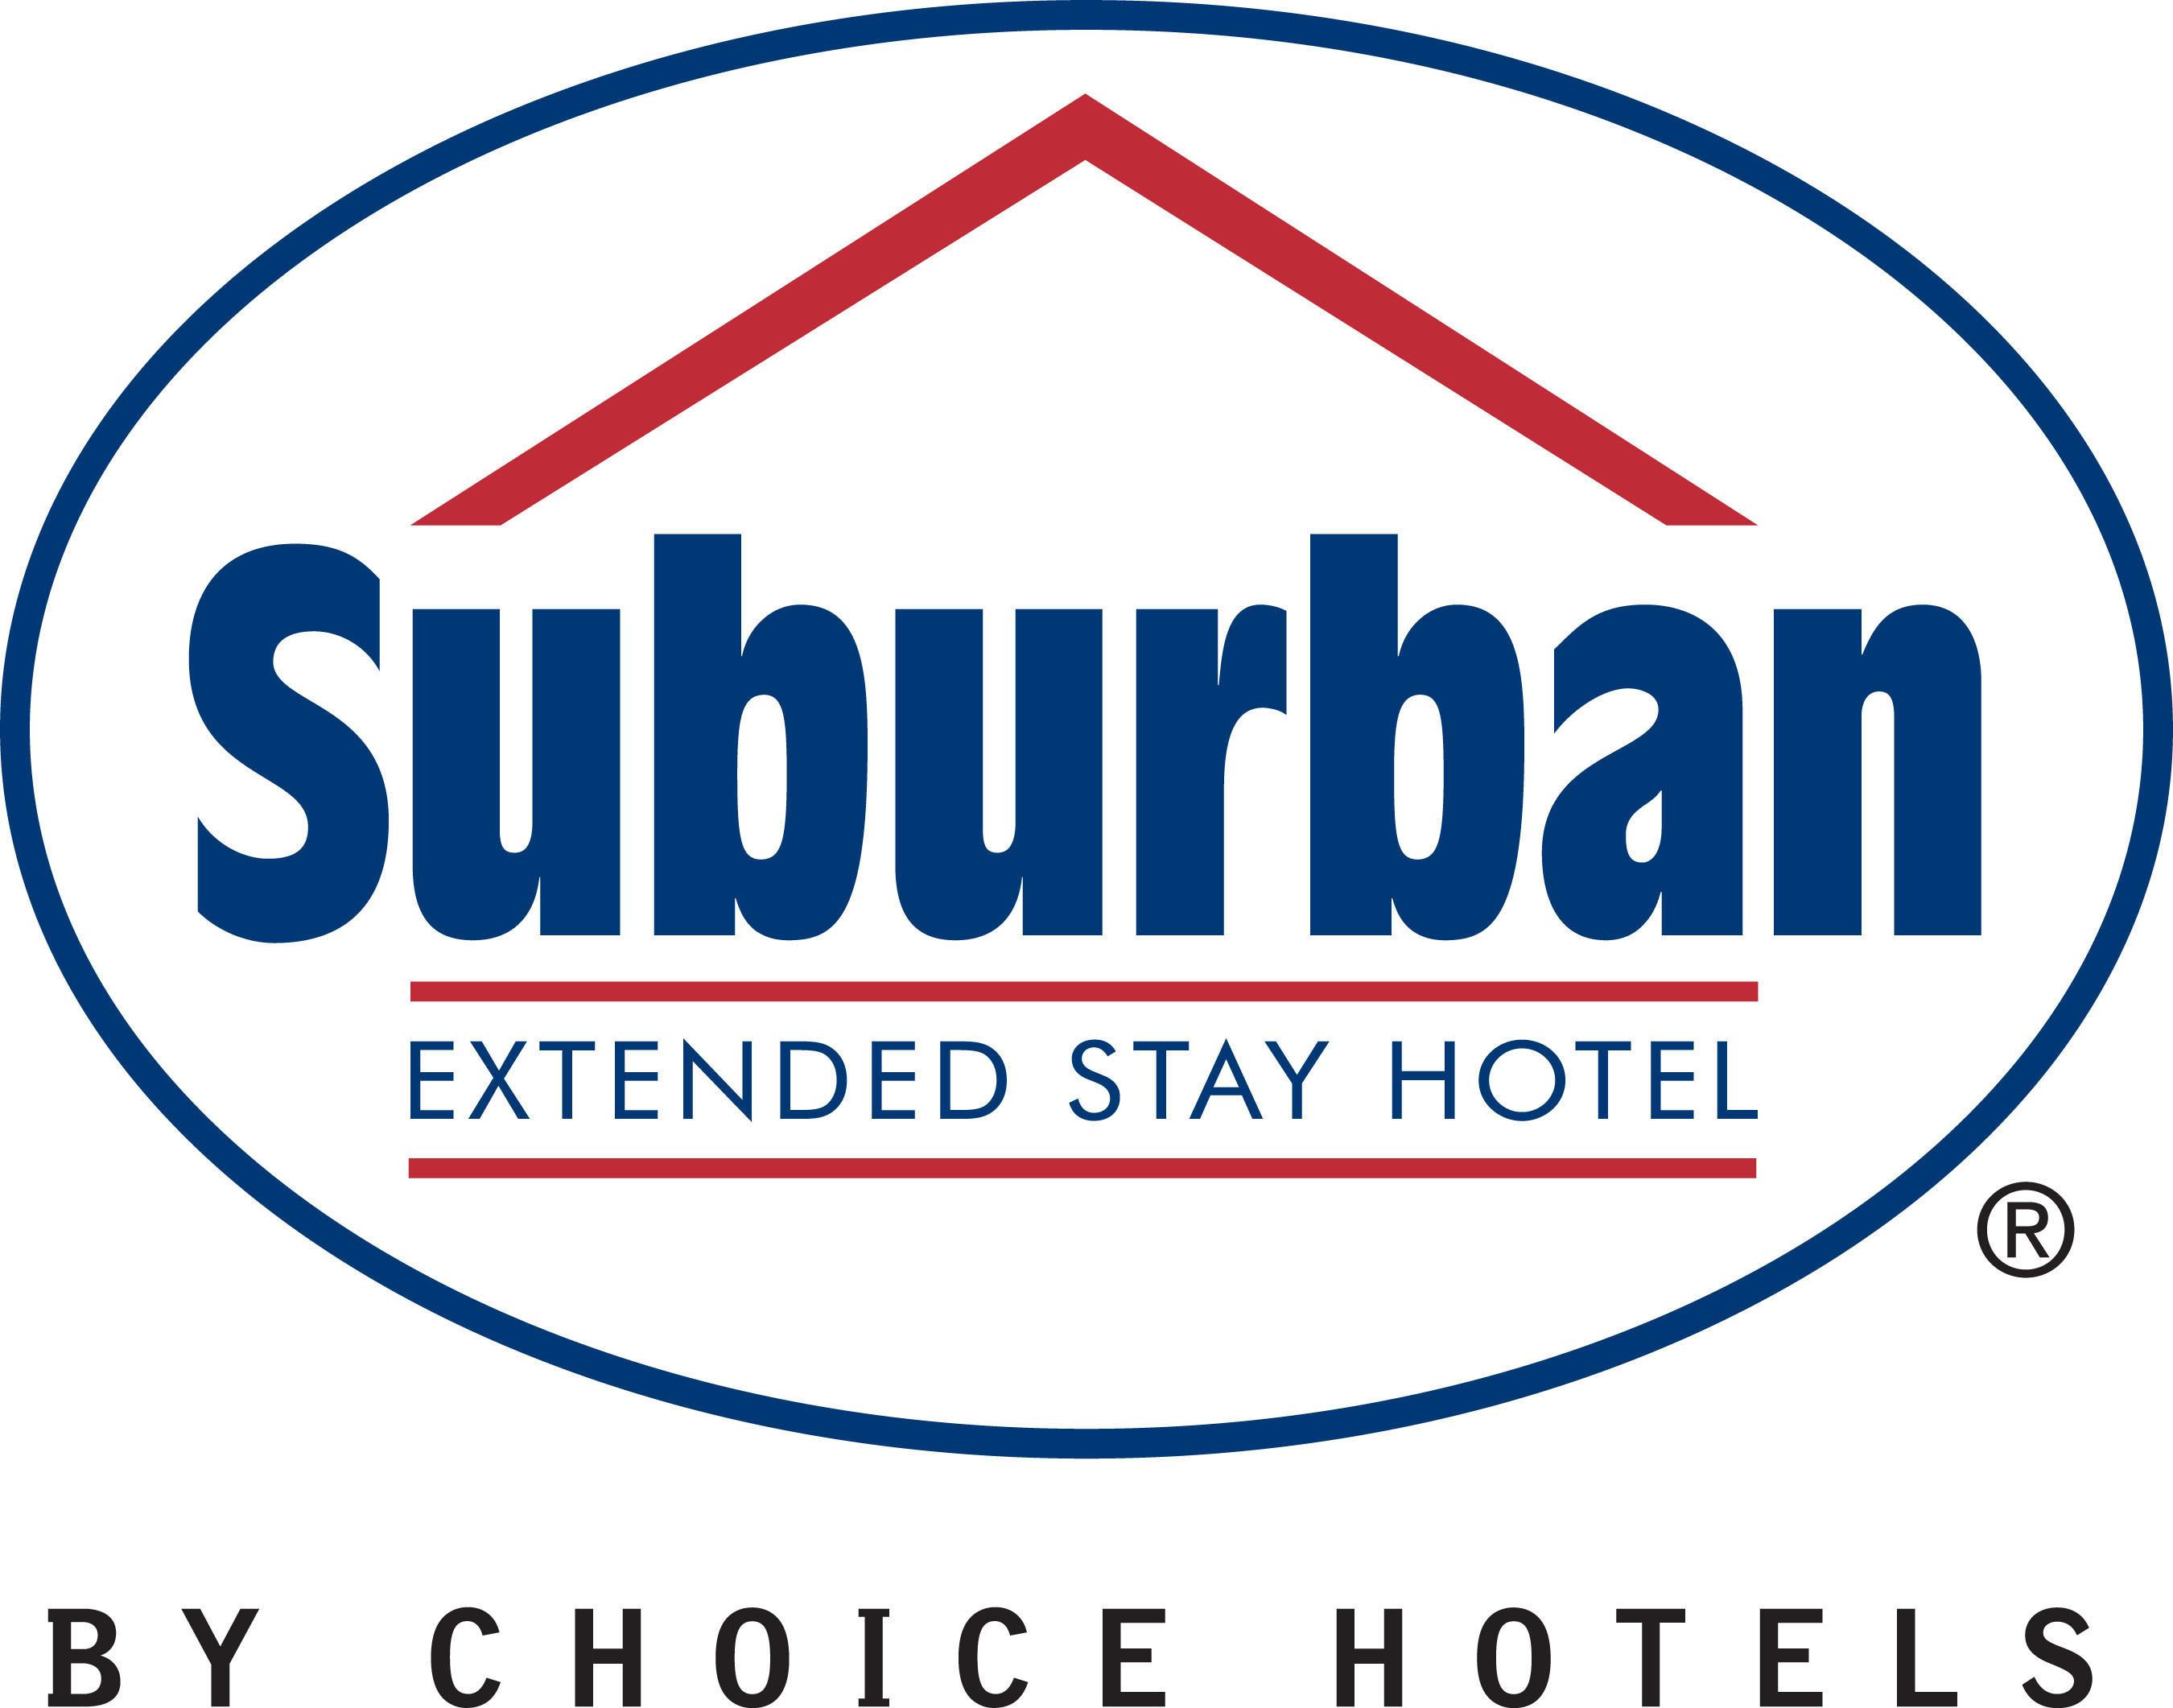 Suburban Extended Stay. (PRNewsFoto/Choice Hotels International) (PRNewsFoto/CHOICE HOTELS INTERNATIONAL)